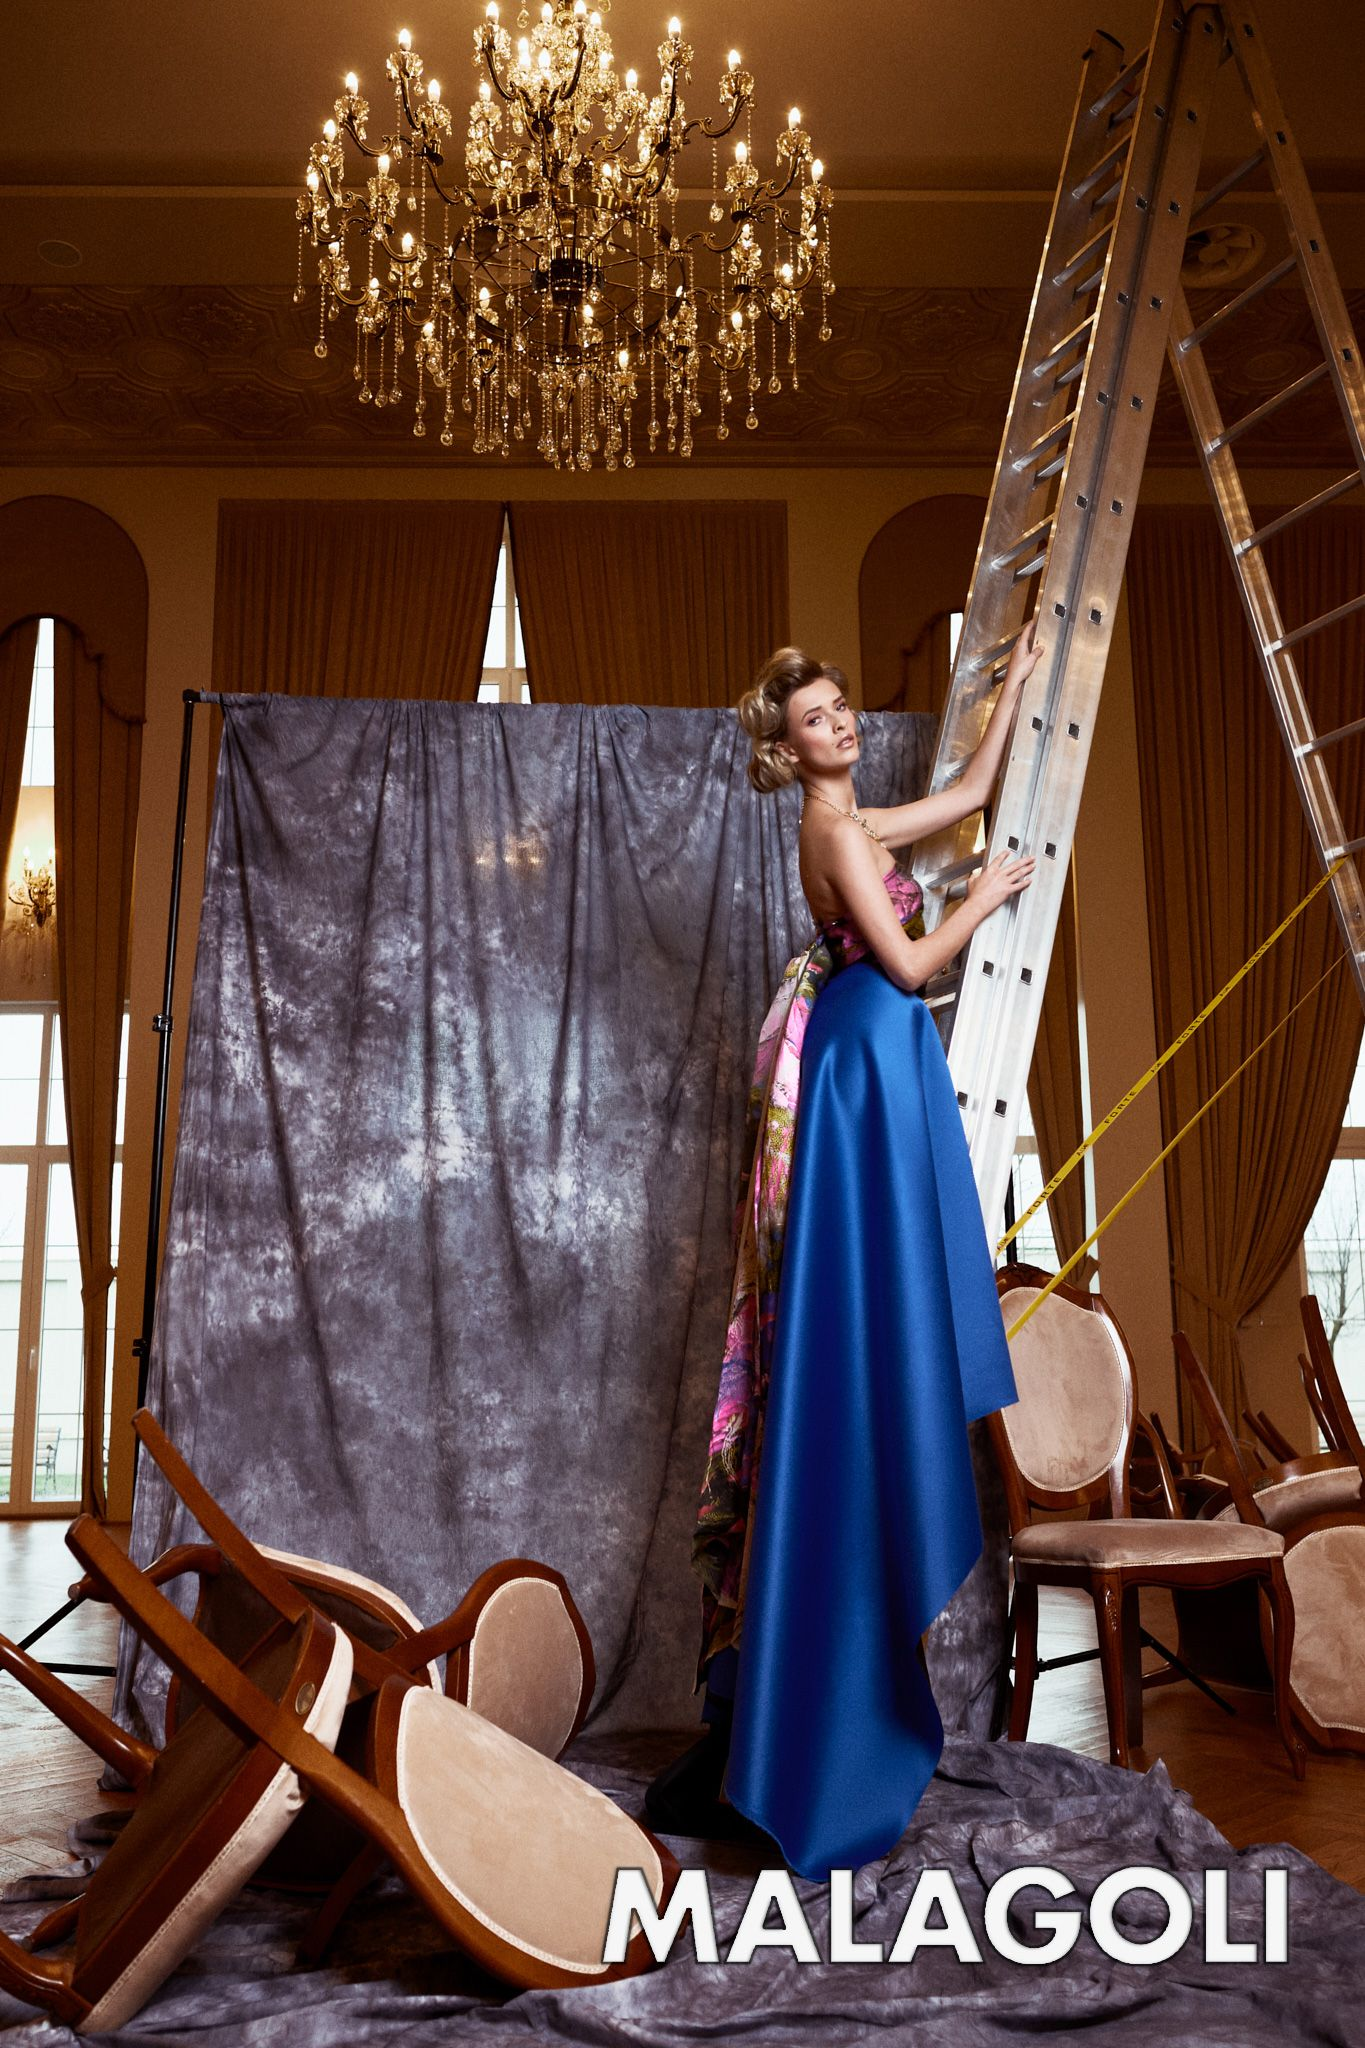 Pin by malagoli fabrics on alta moda campaign pinterest campaign fashion fashion fabric and fashion